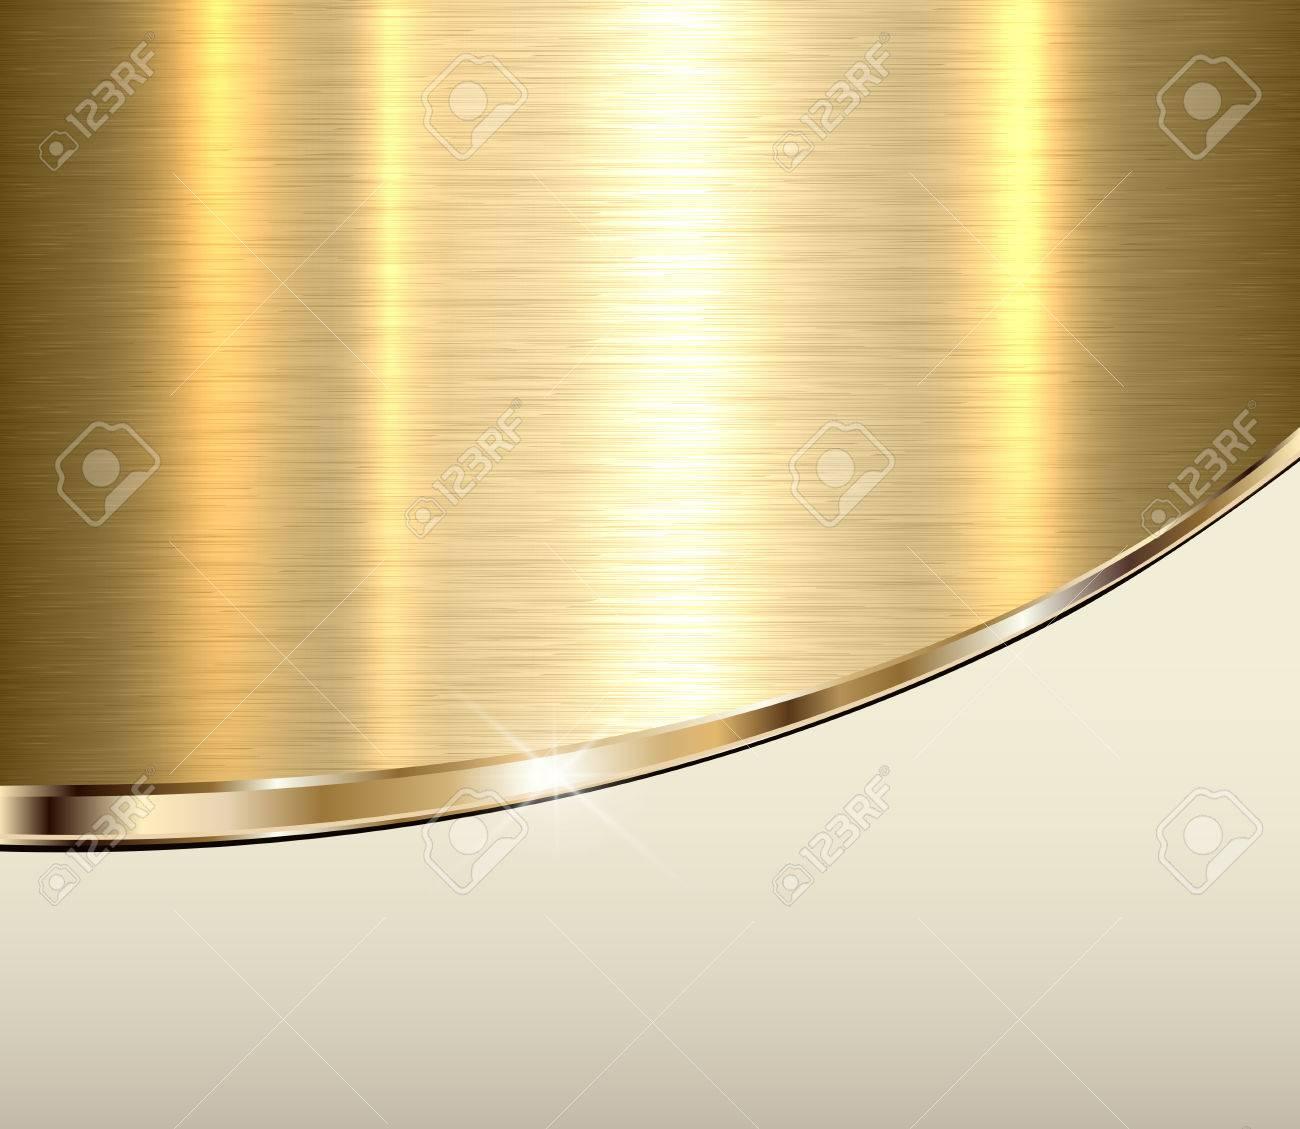 fondo de metal dorado textura metálica vector dorado elegante